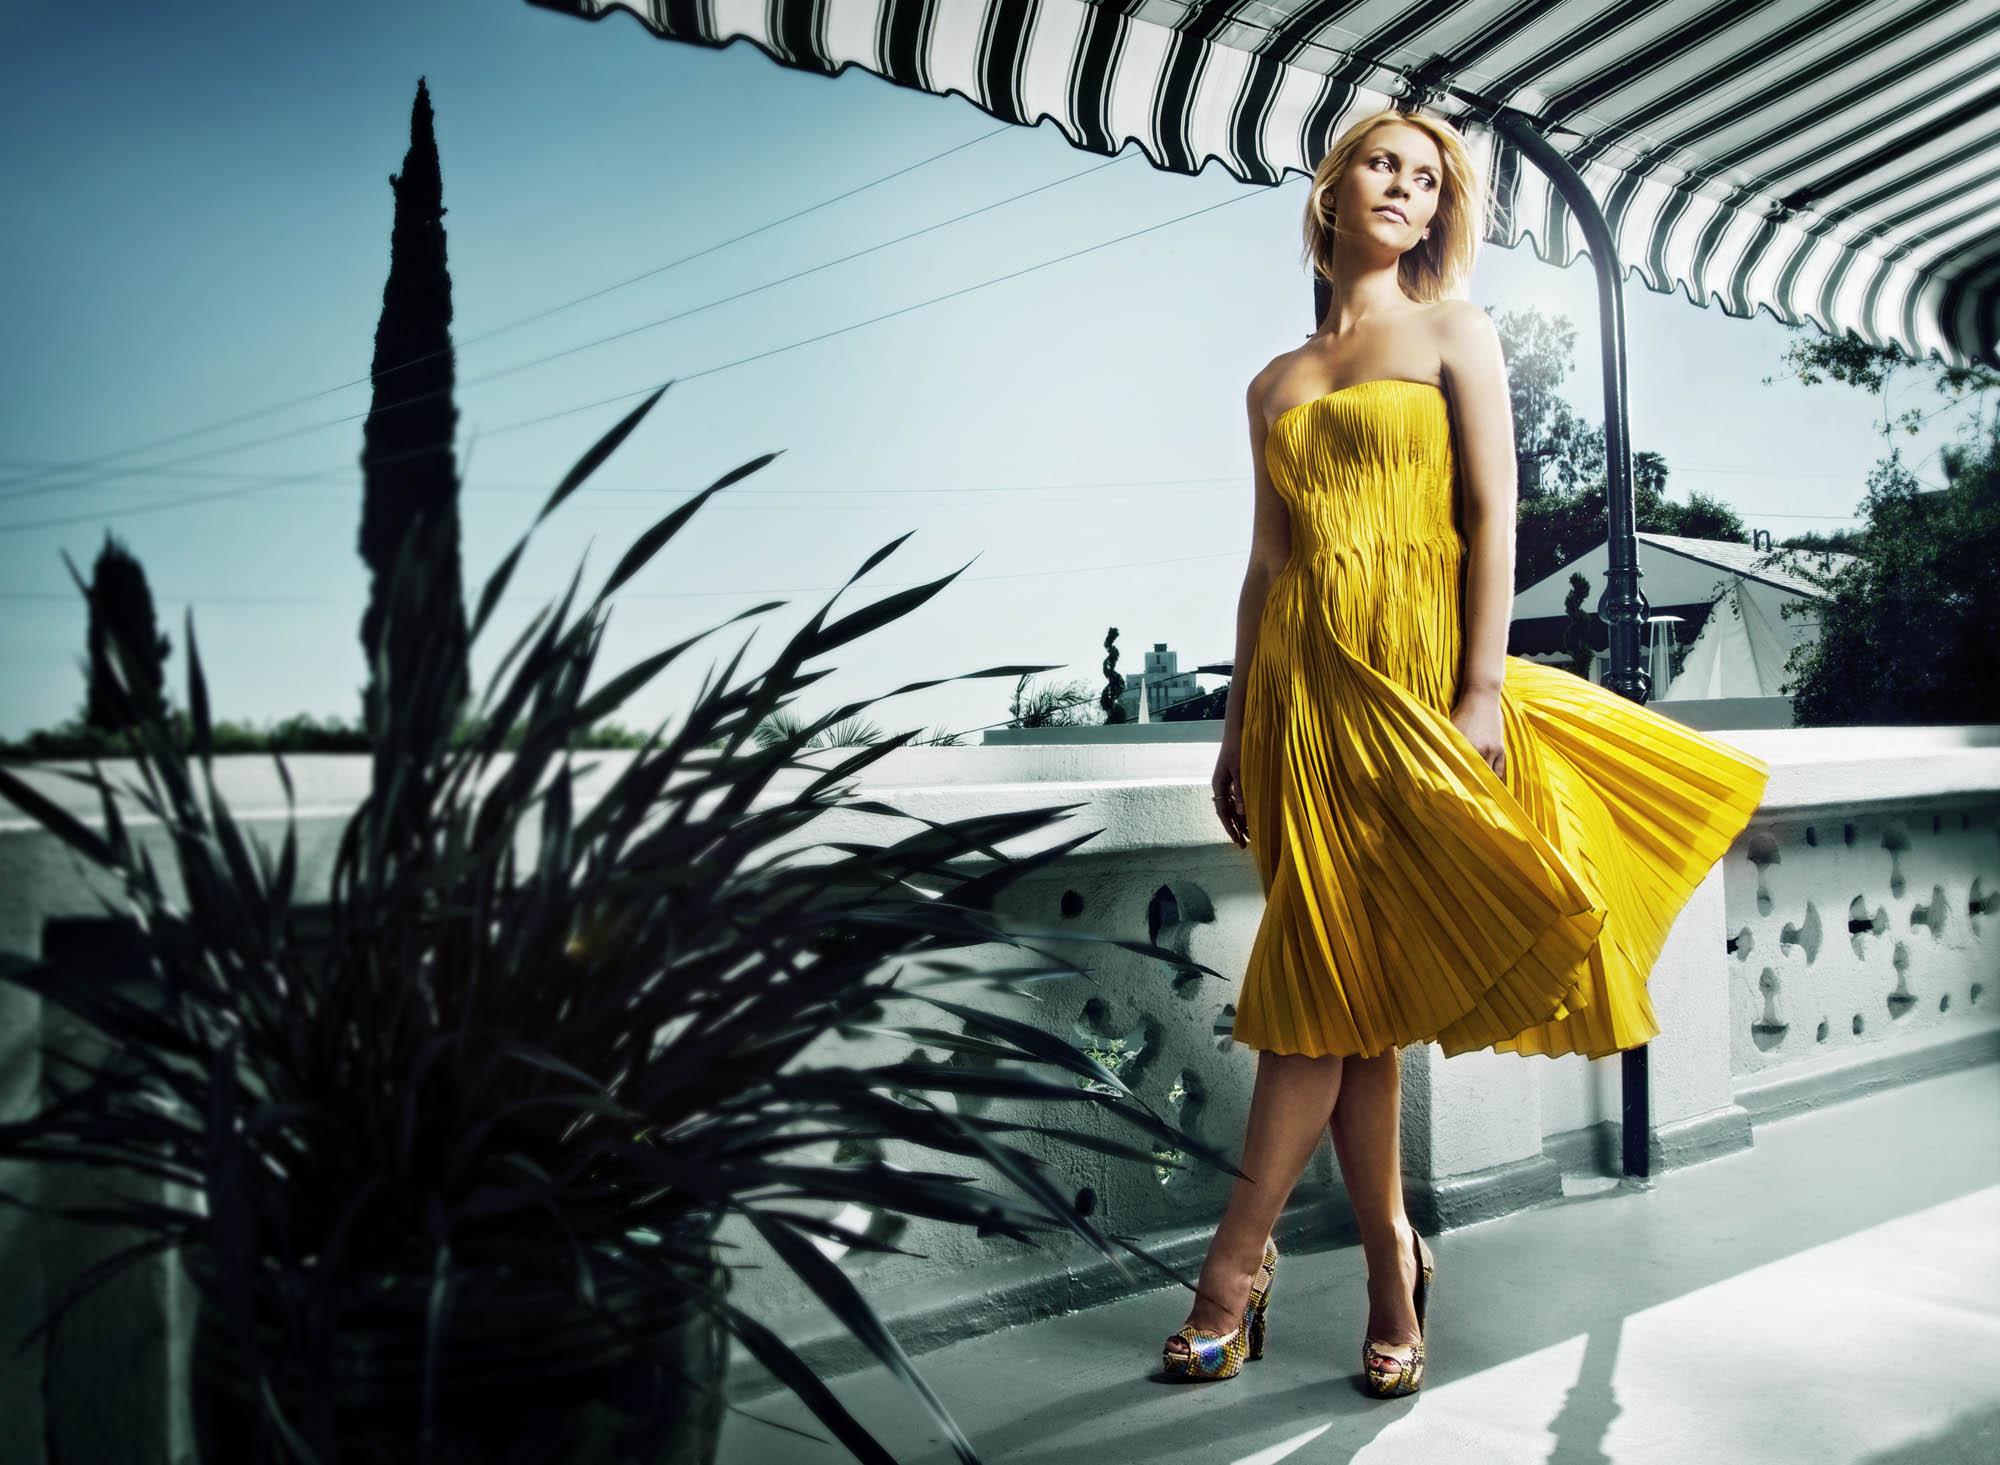 Claire Danes walk2.jpg